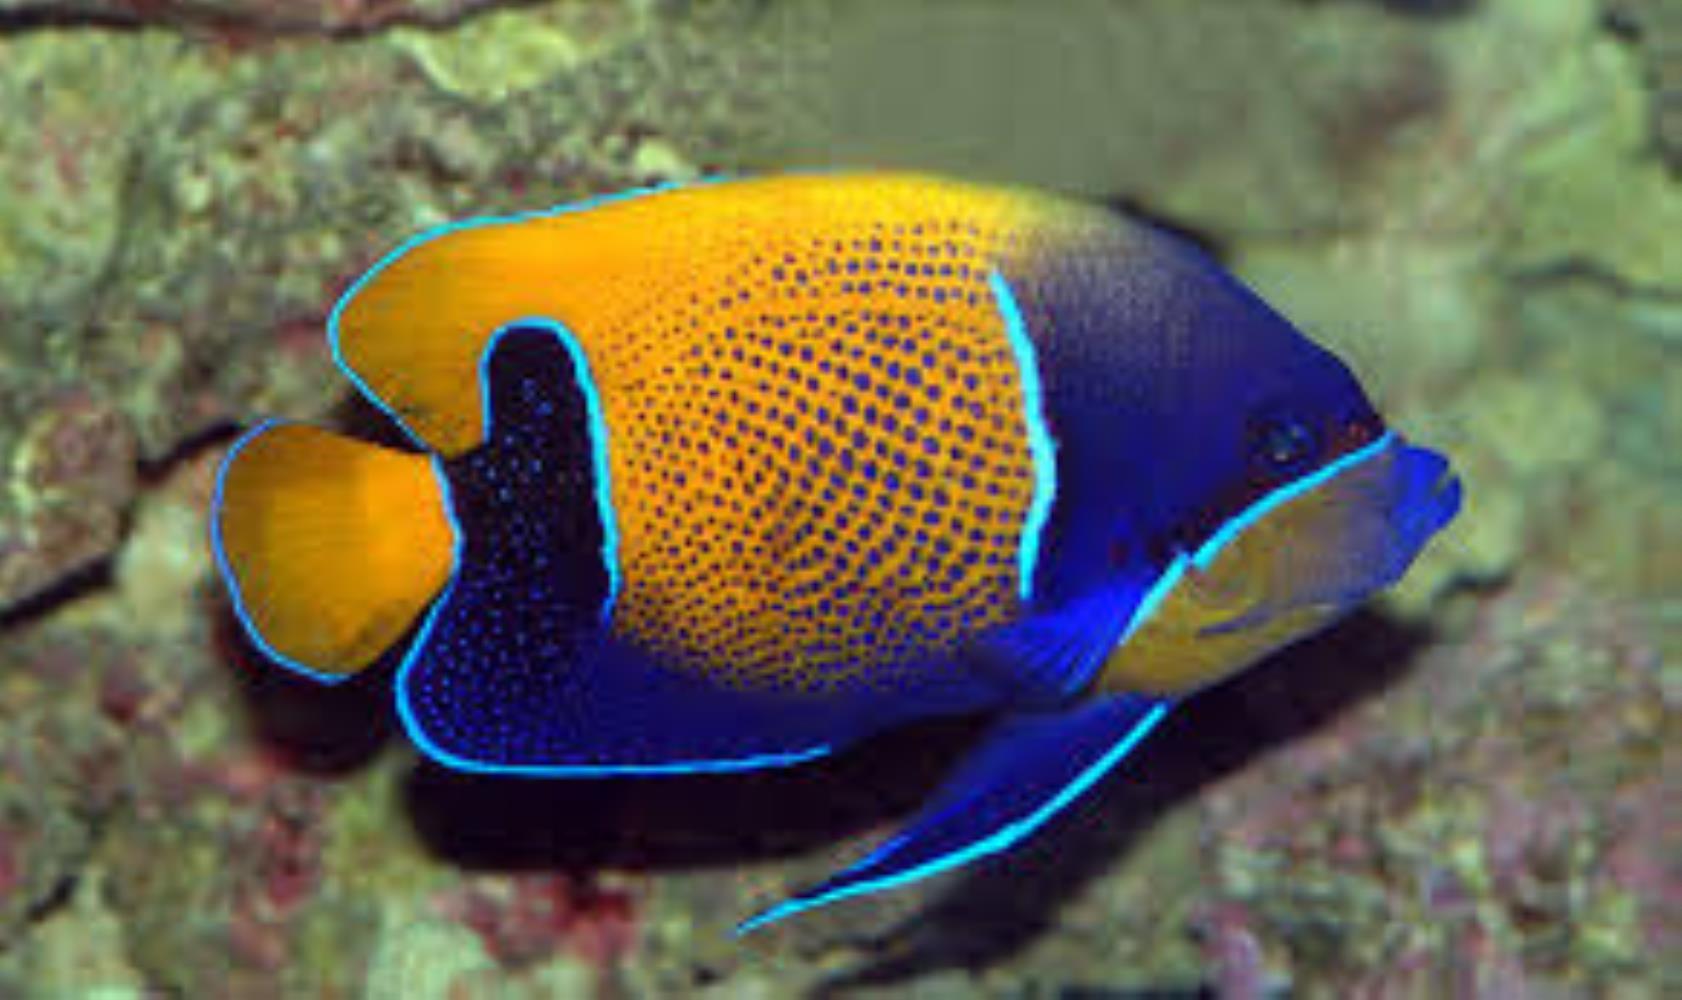 Bluegirdled Angelfish